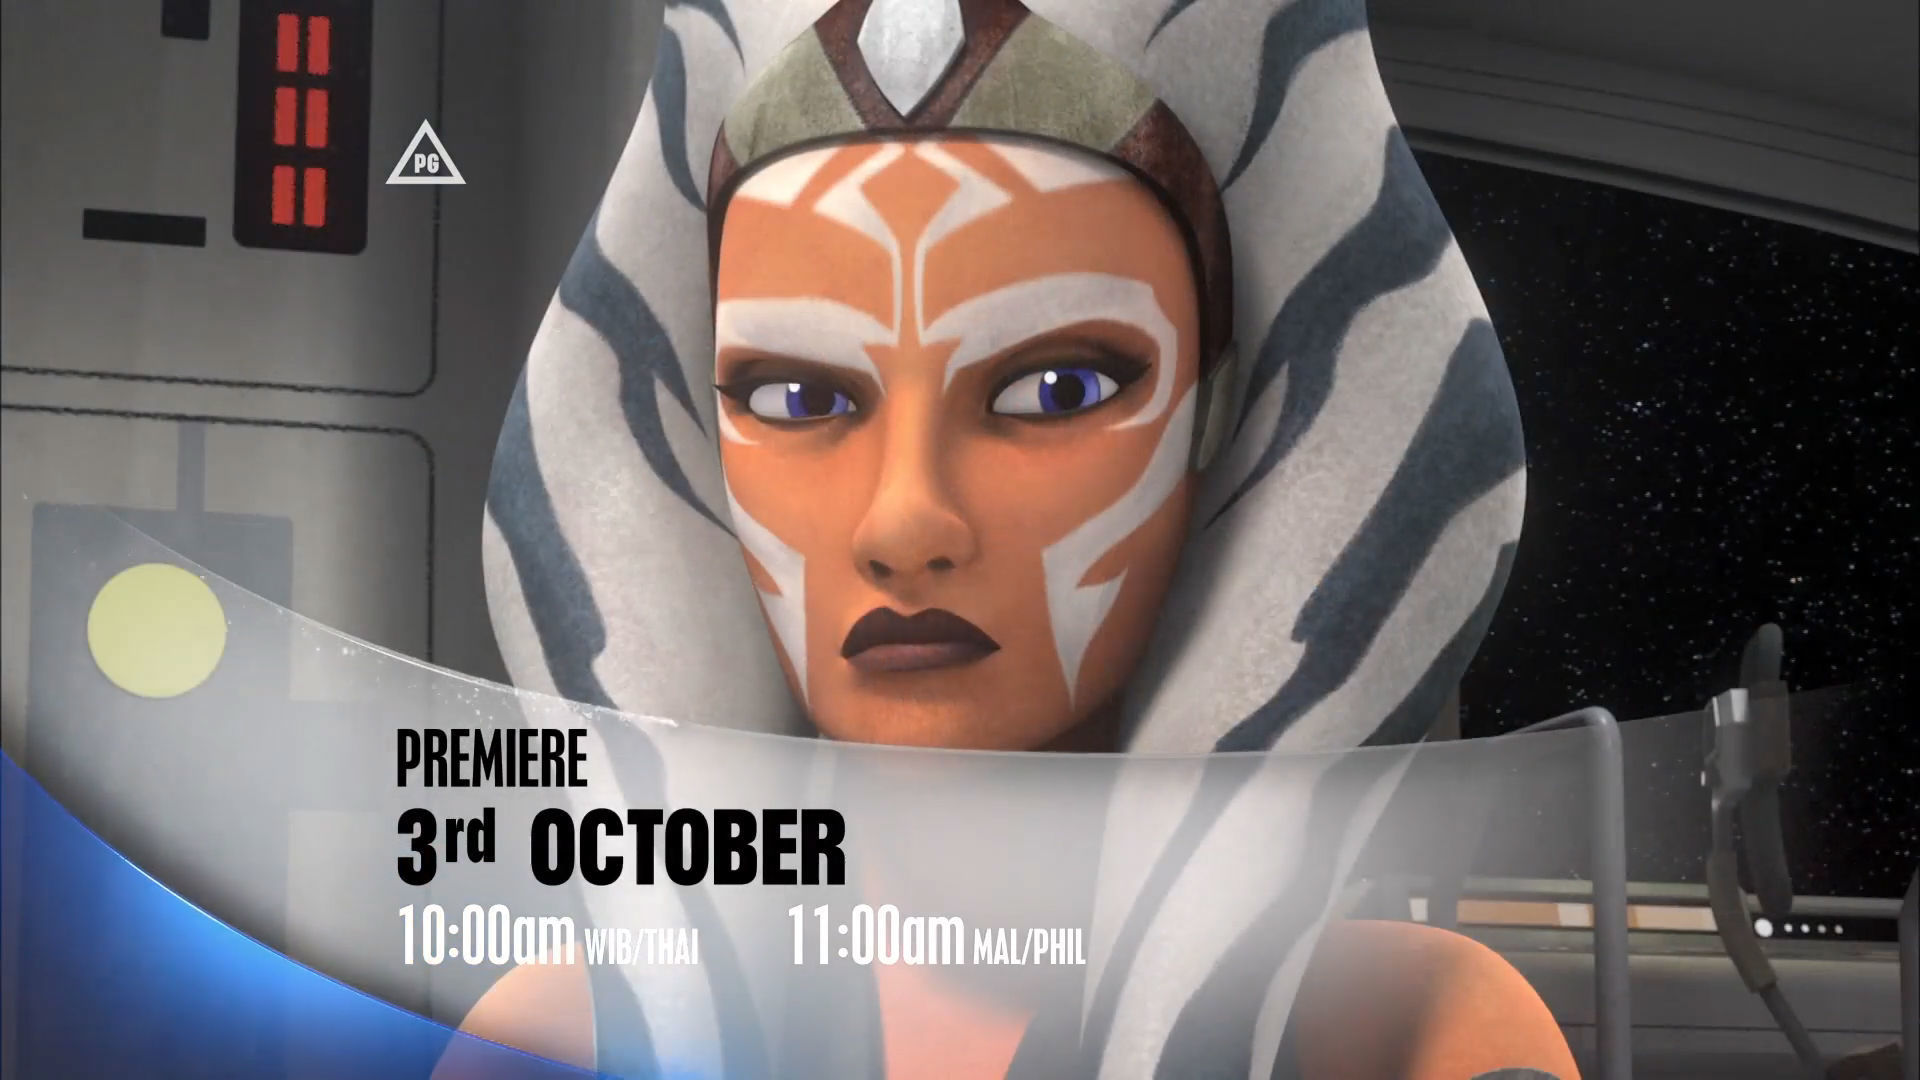 Star Wars Rebels: The Siege Of Lothal On Disney Channel Trailer 2